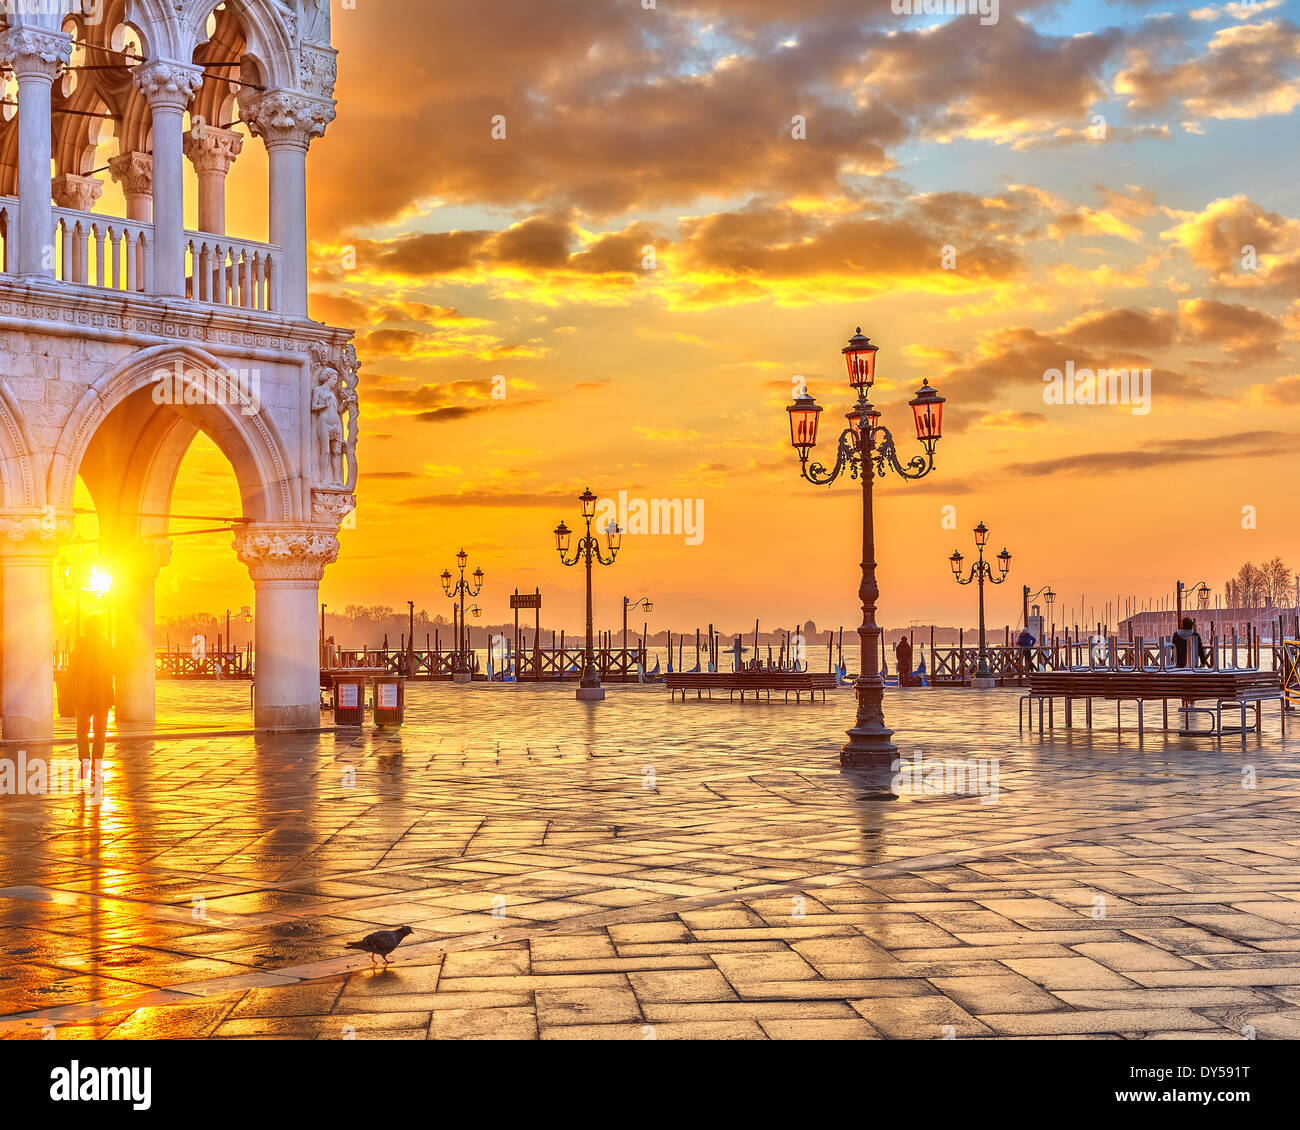 Sunrise in Venice - Stock Image